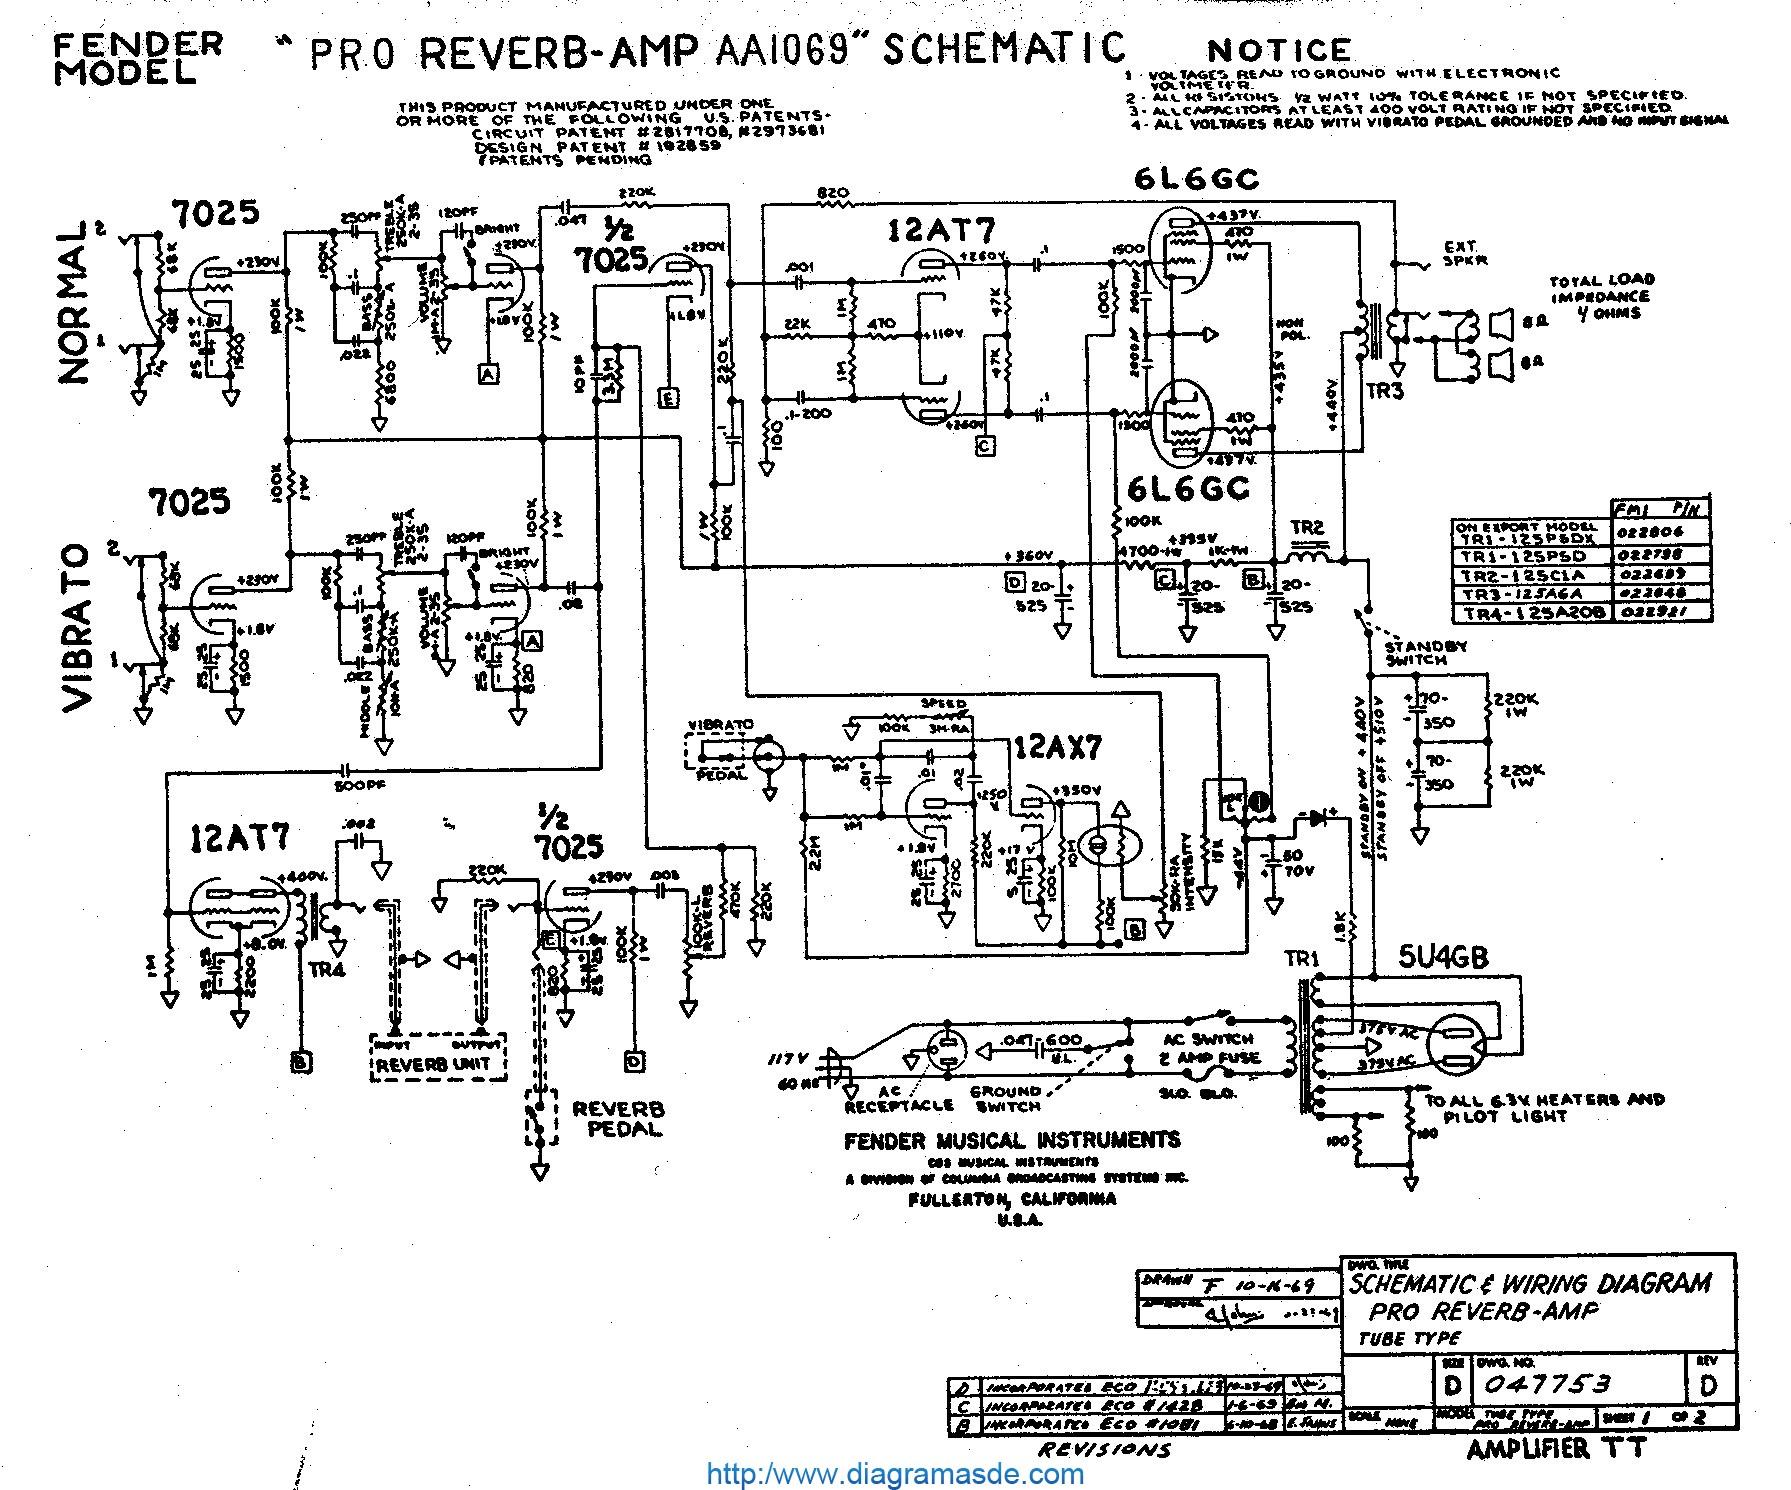 pro_reverb_aa1069_schem.pdf